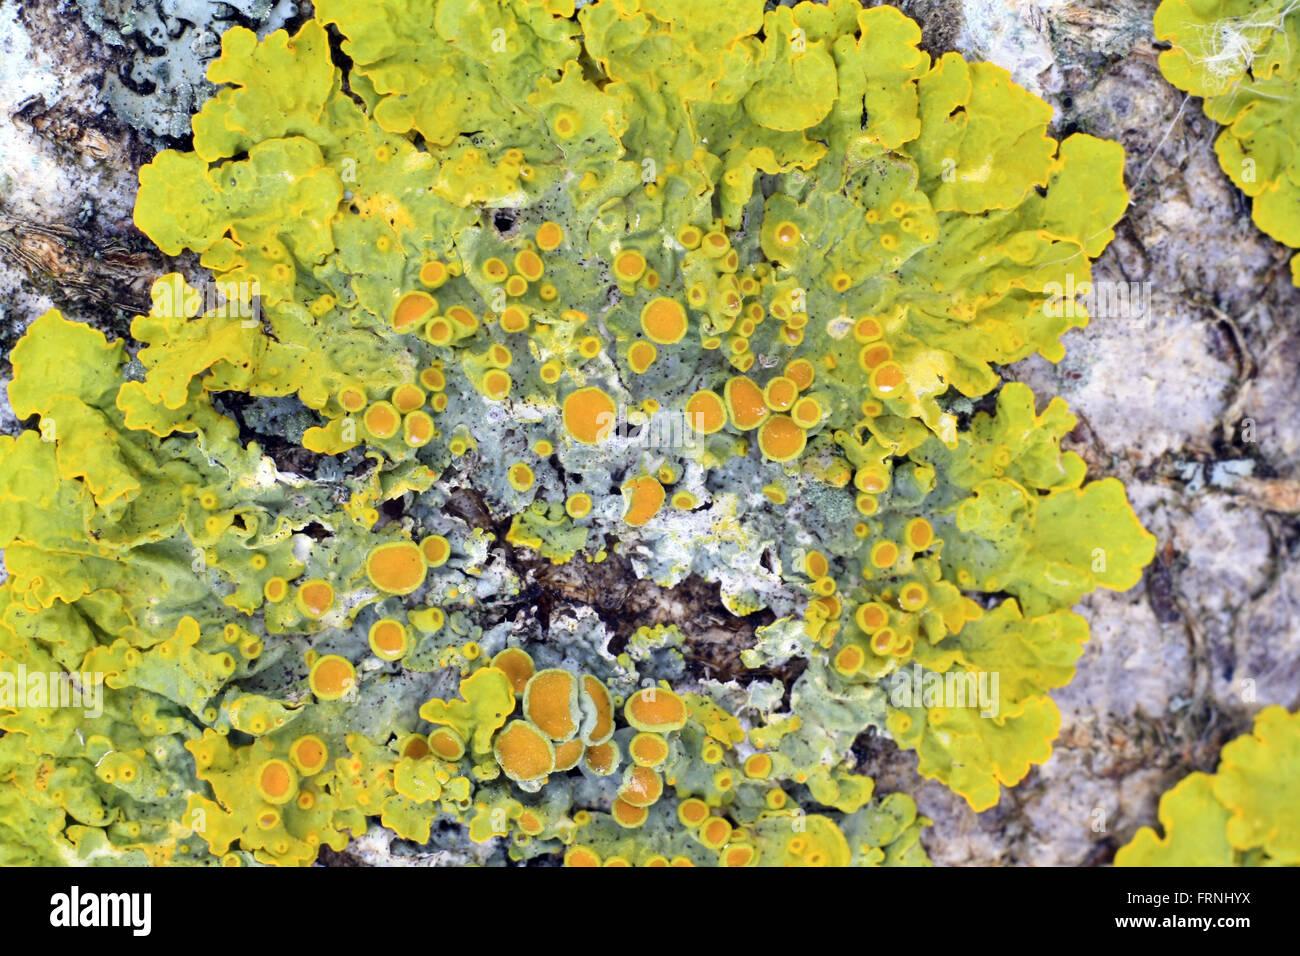 green lichen on tree bark extreme closeup - Stock Image